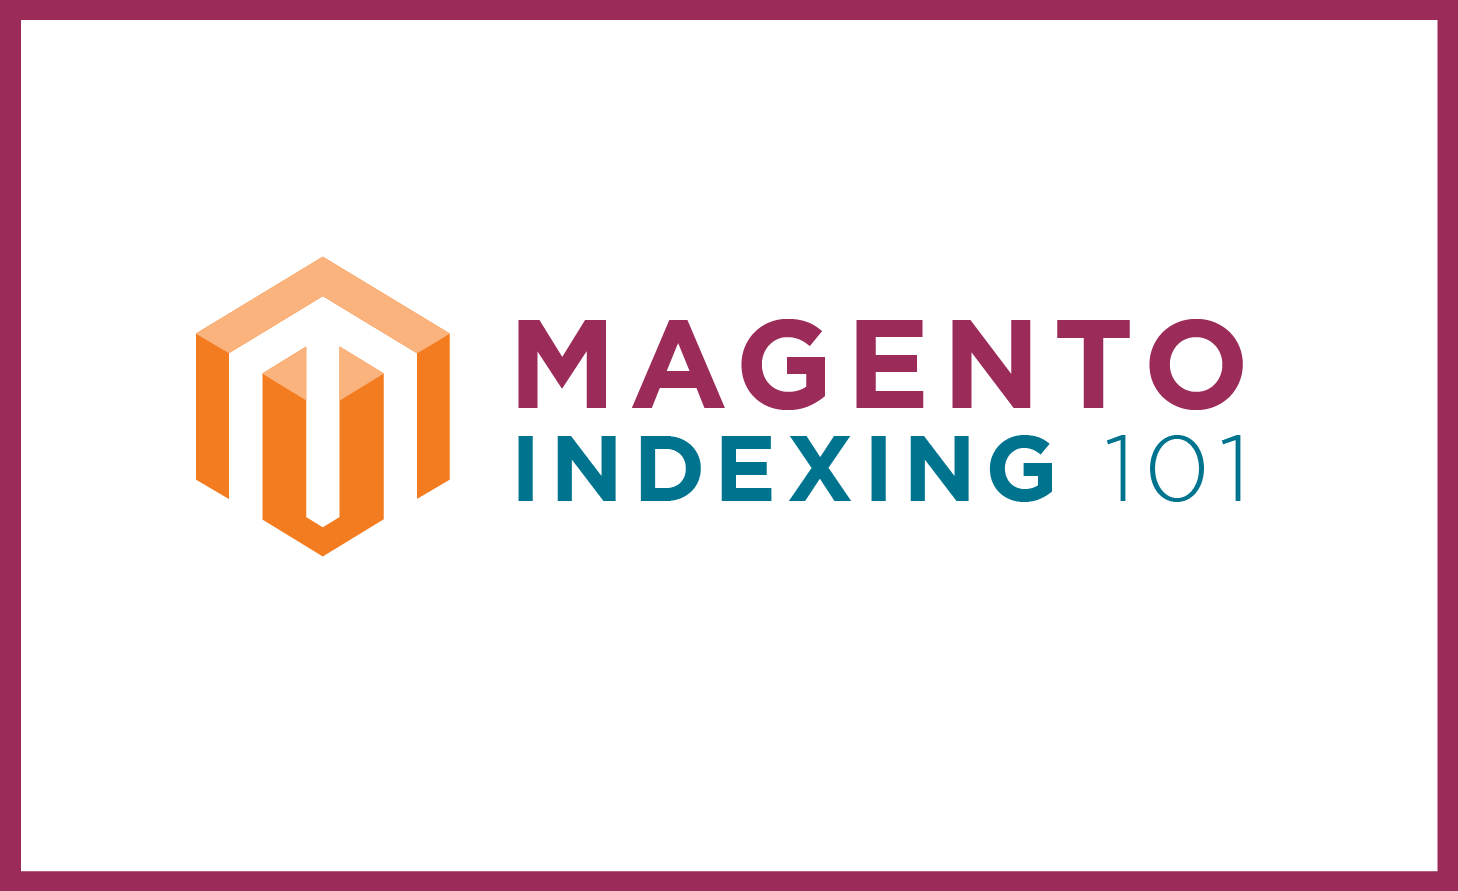 magento-indexing-101-linkedin